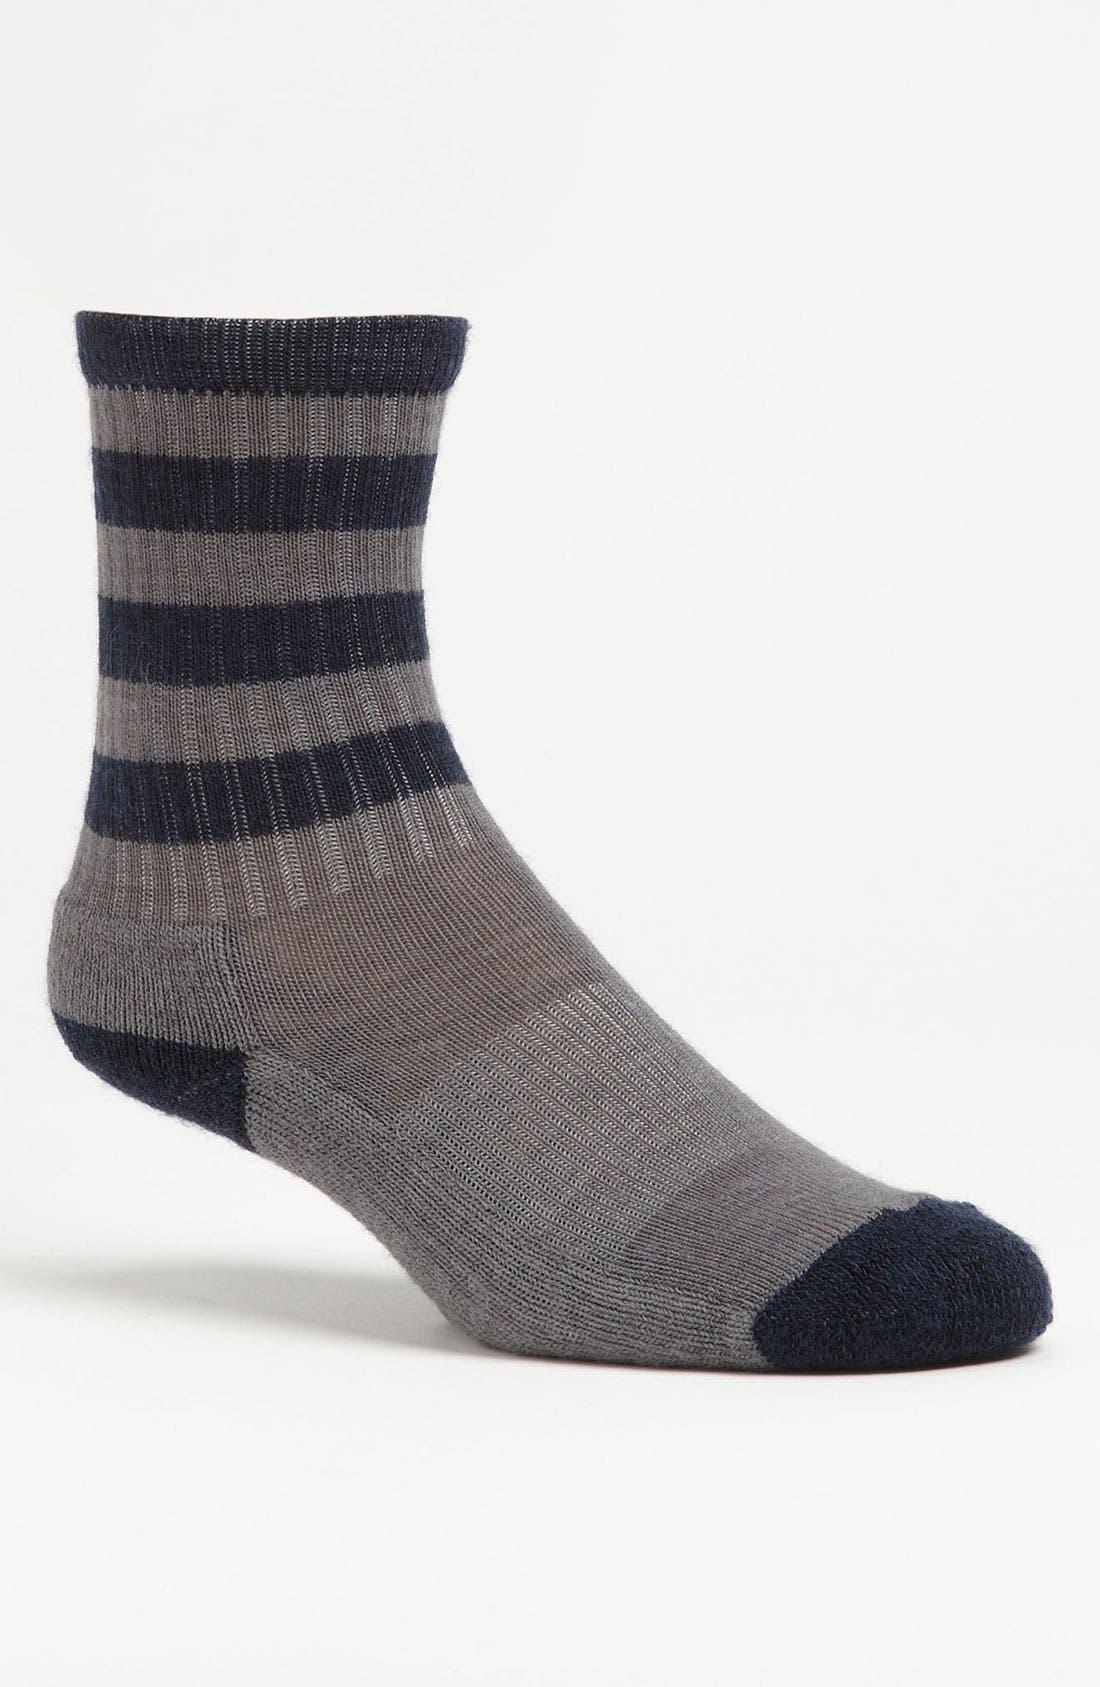 Alternate Image 1 Selected - Smartwool Stripe Hiking Light Socks